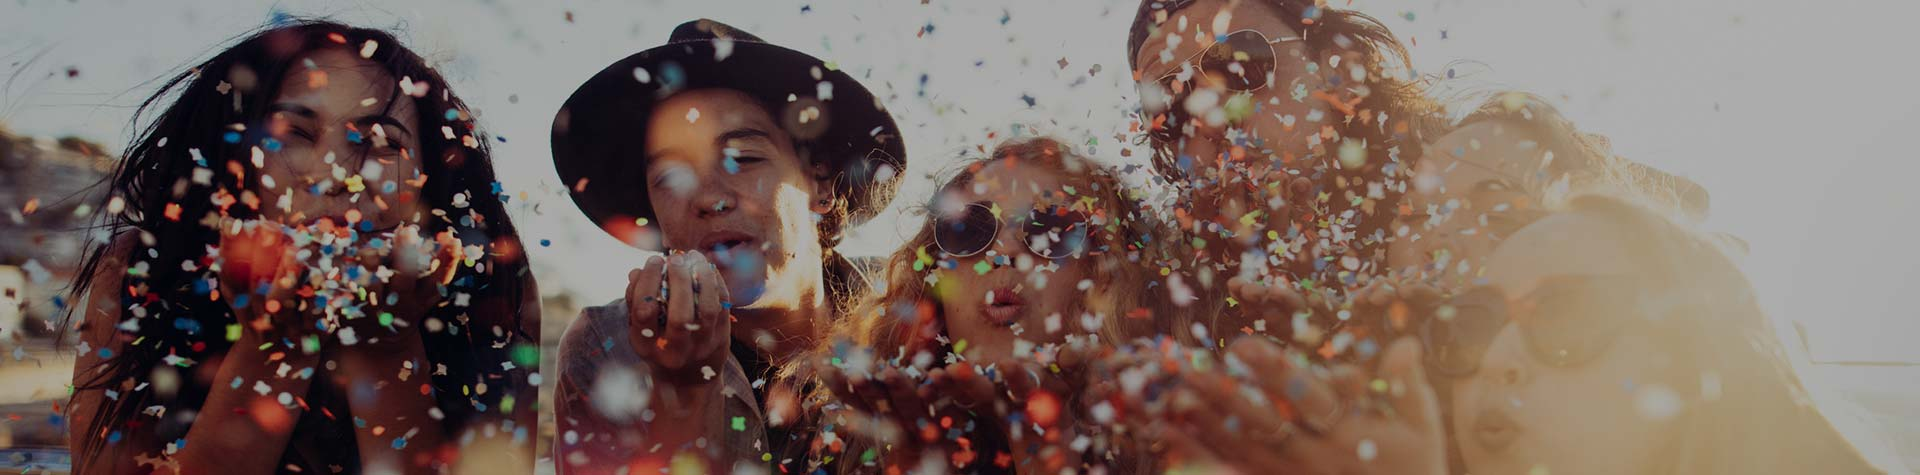 friends blowing confetti